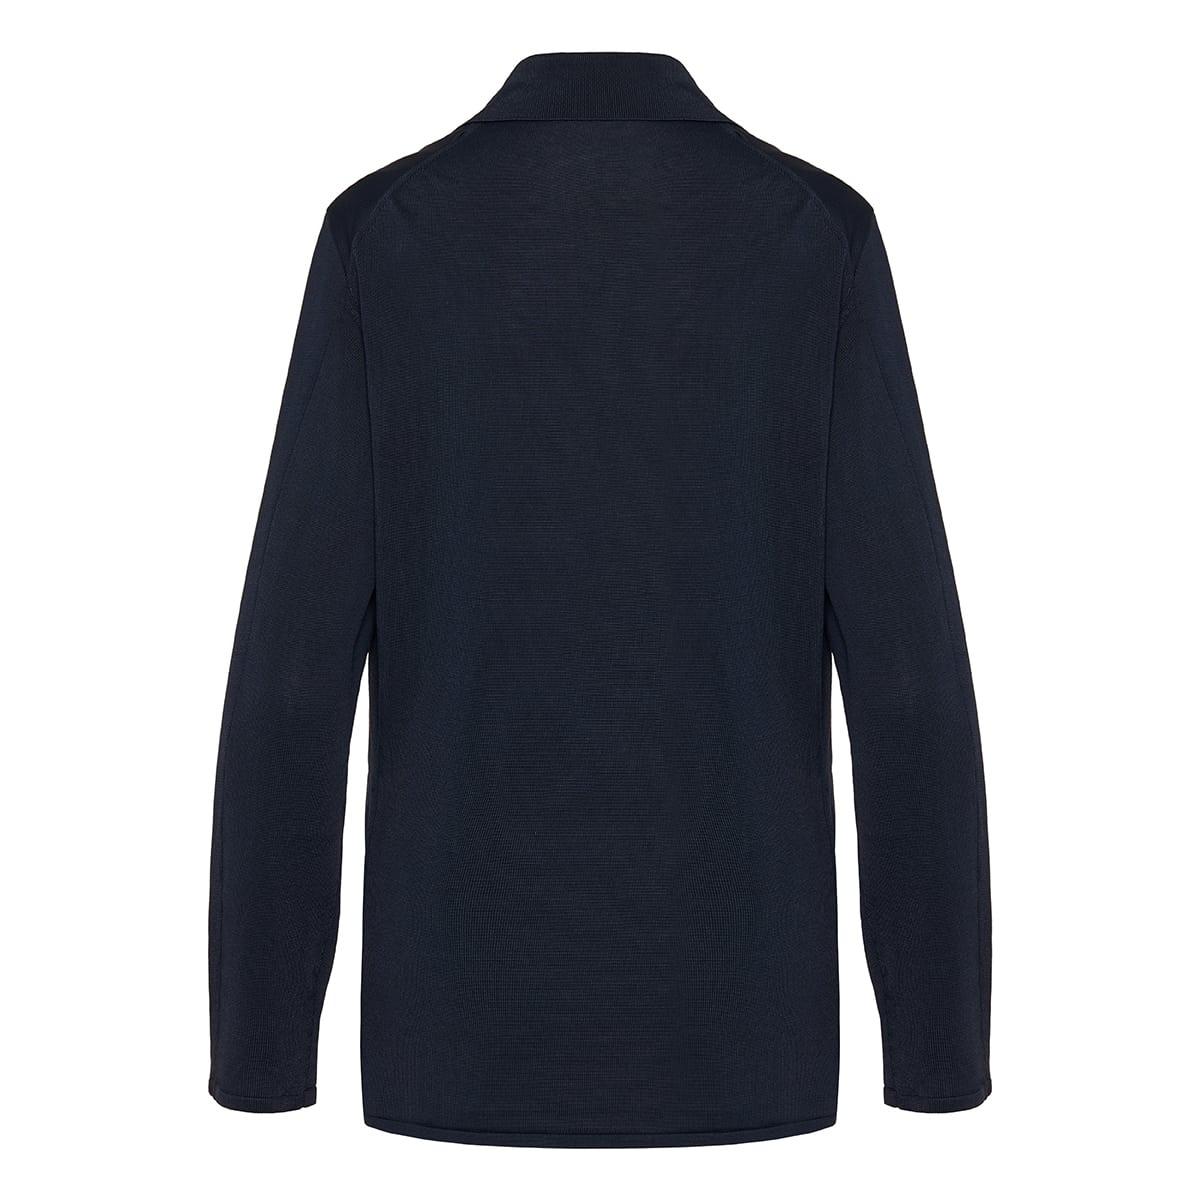 Clarice jersey jacket